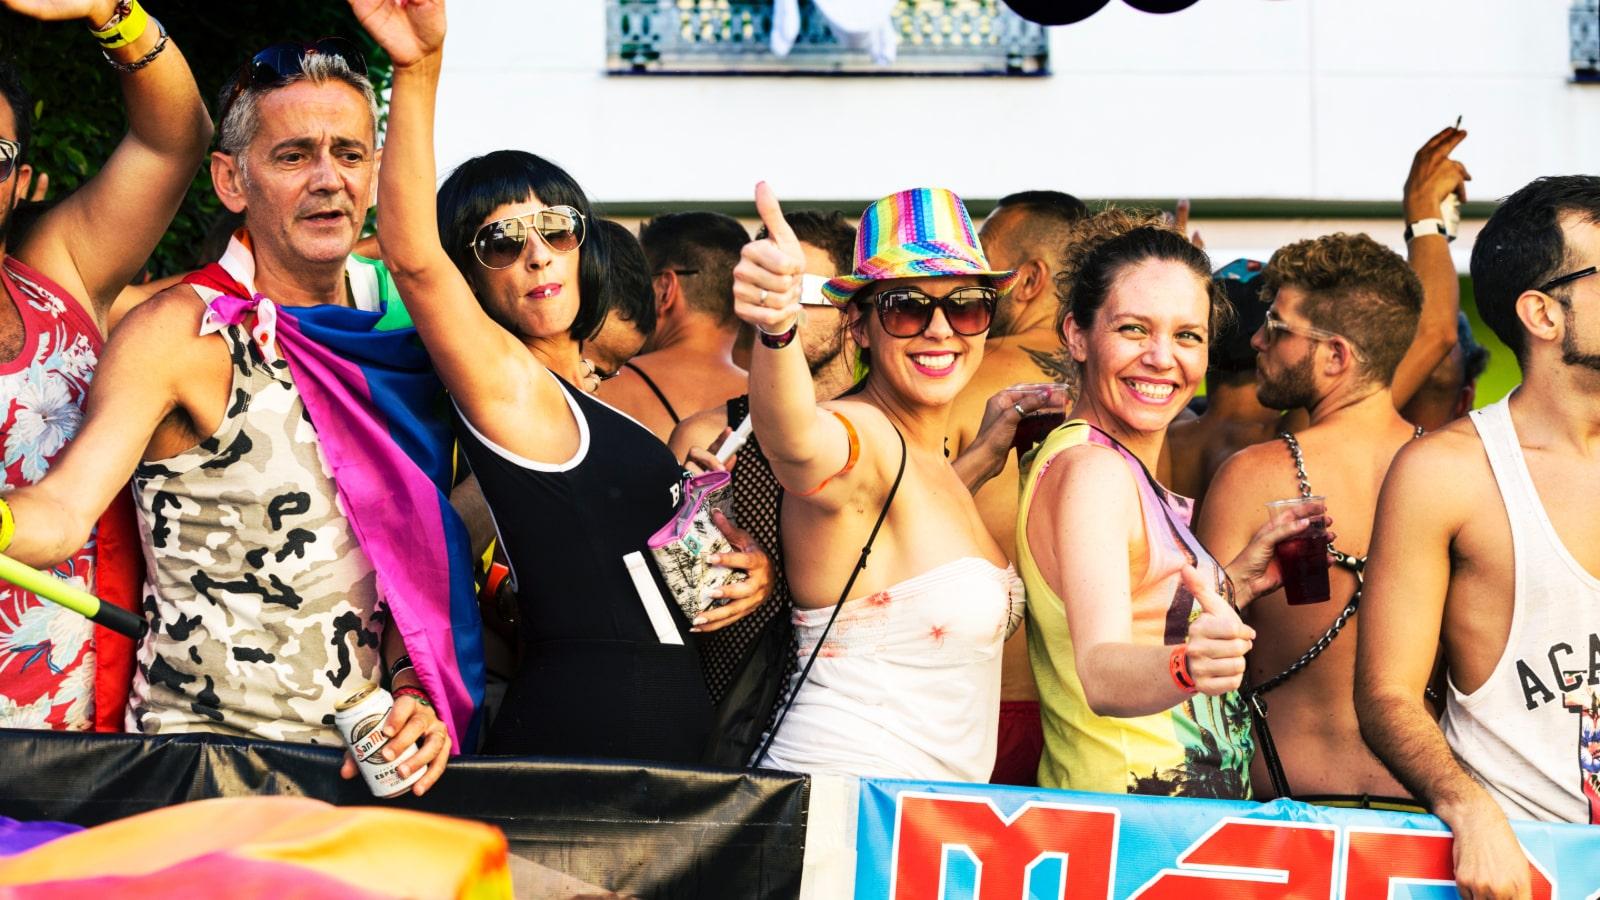 ibiza spain gay bars